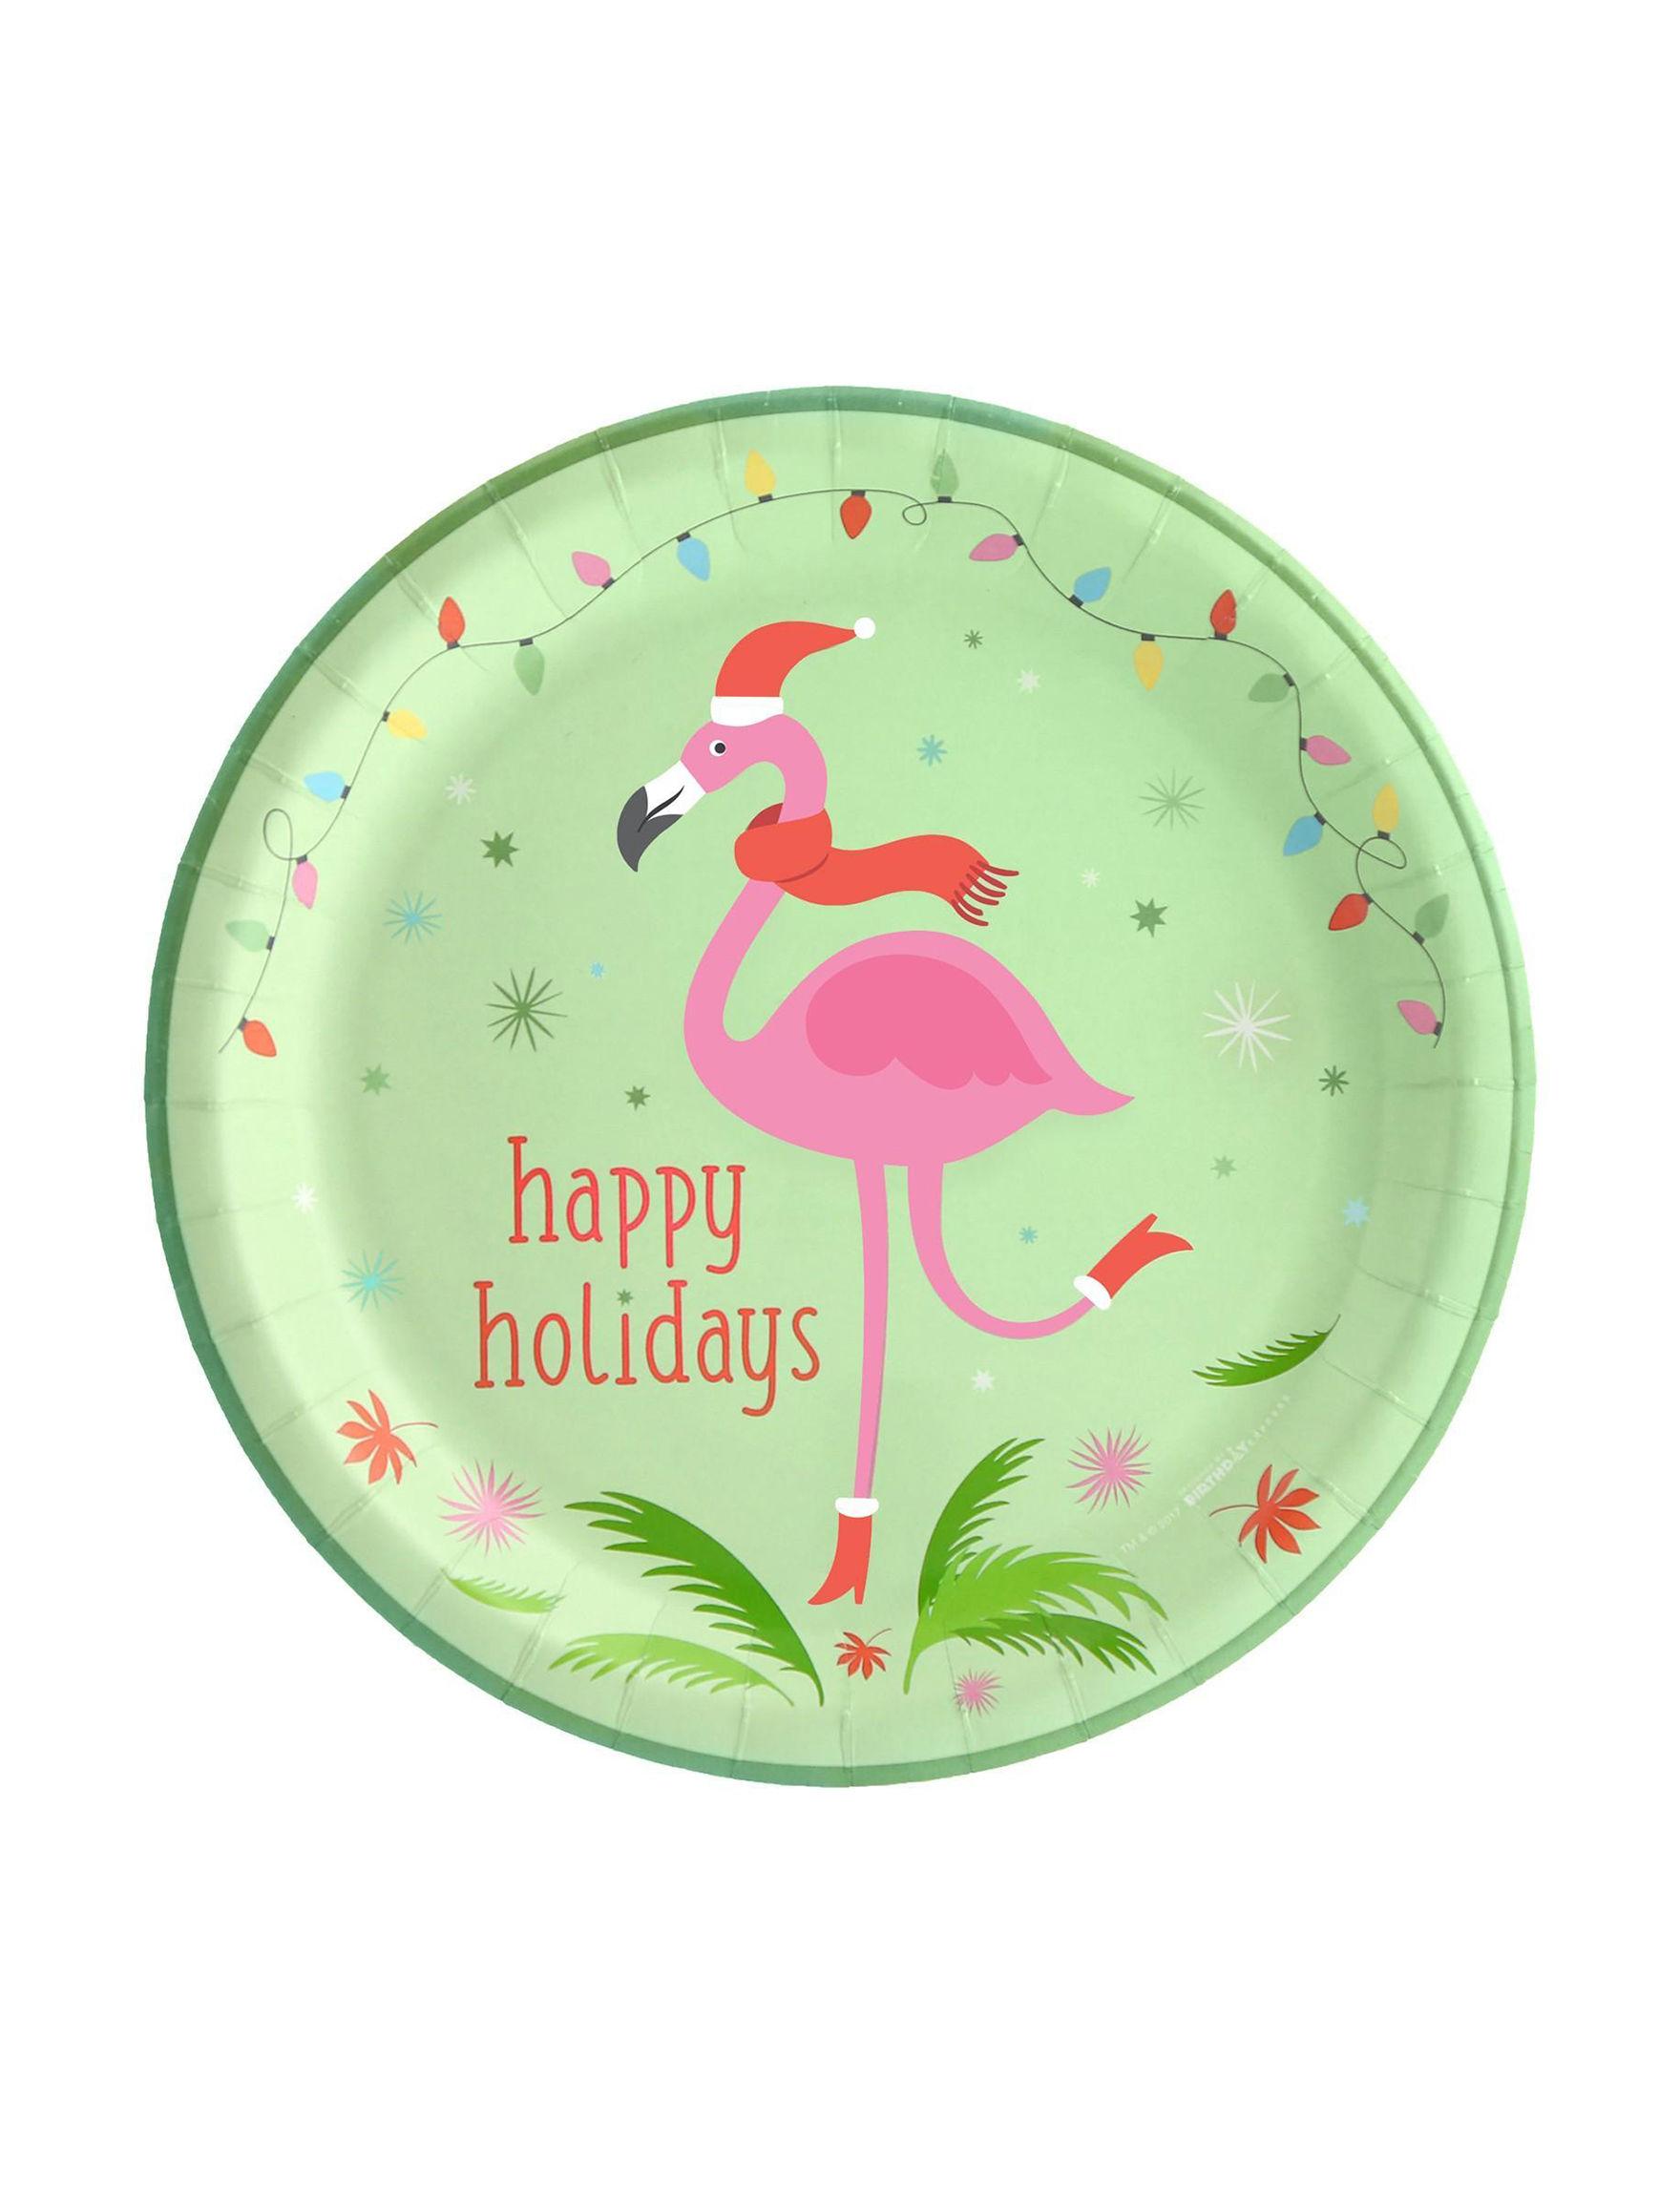 BuySeasons Green Multi Decorative Objects Holiday Dining & Entertaining Holiday Decor Serveware